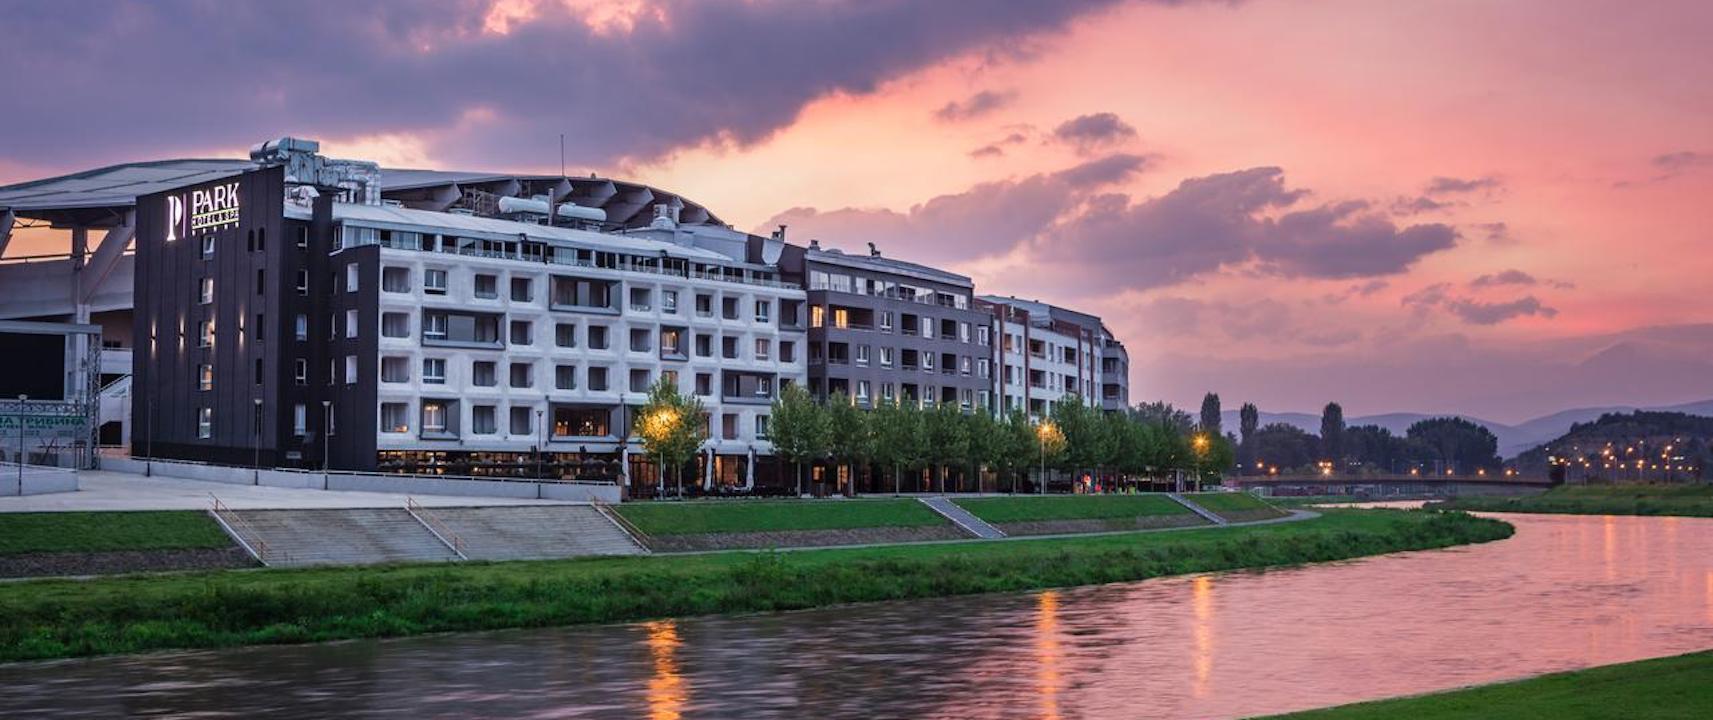 Park Hotel and Spa , Skopje / Macedonia